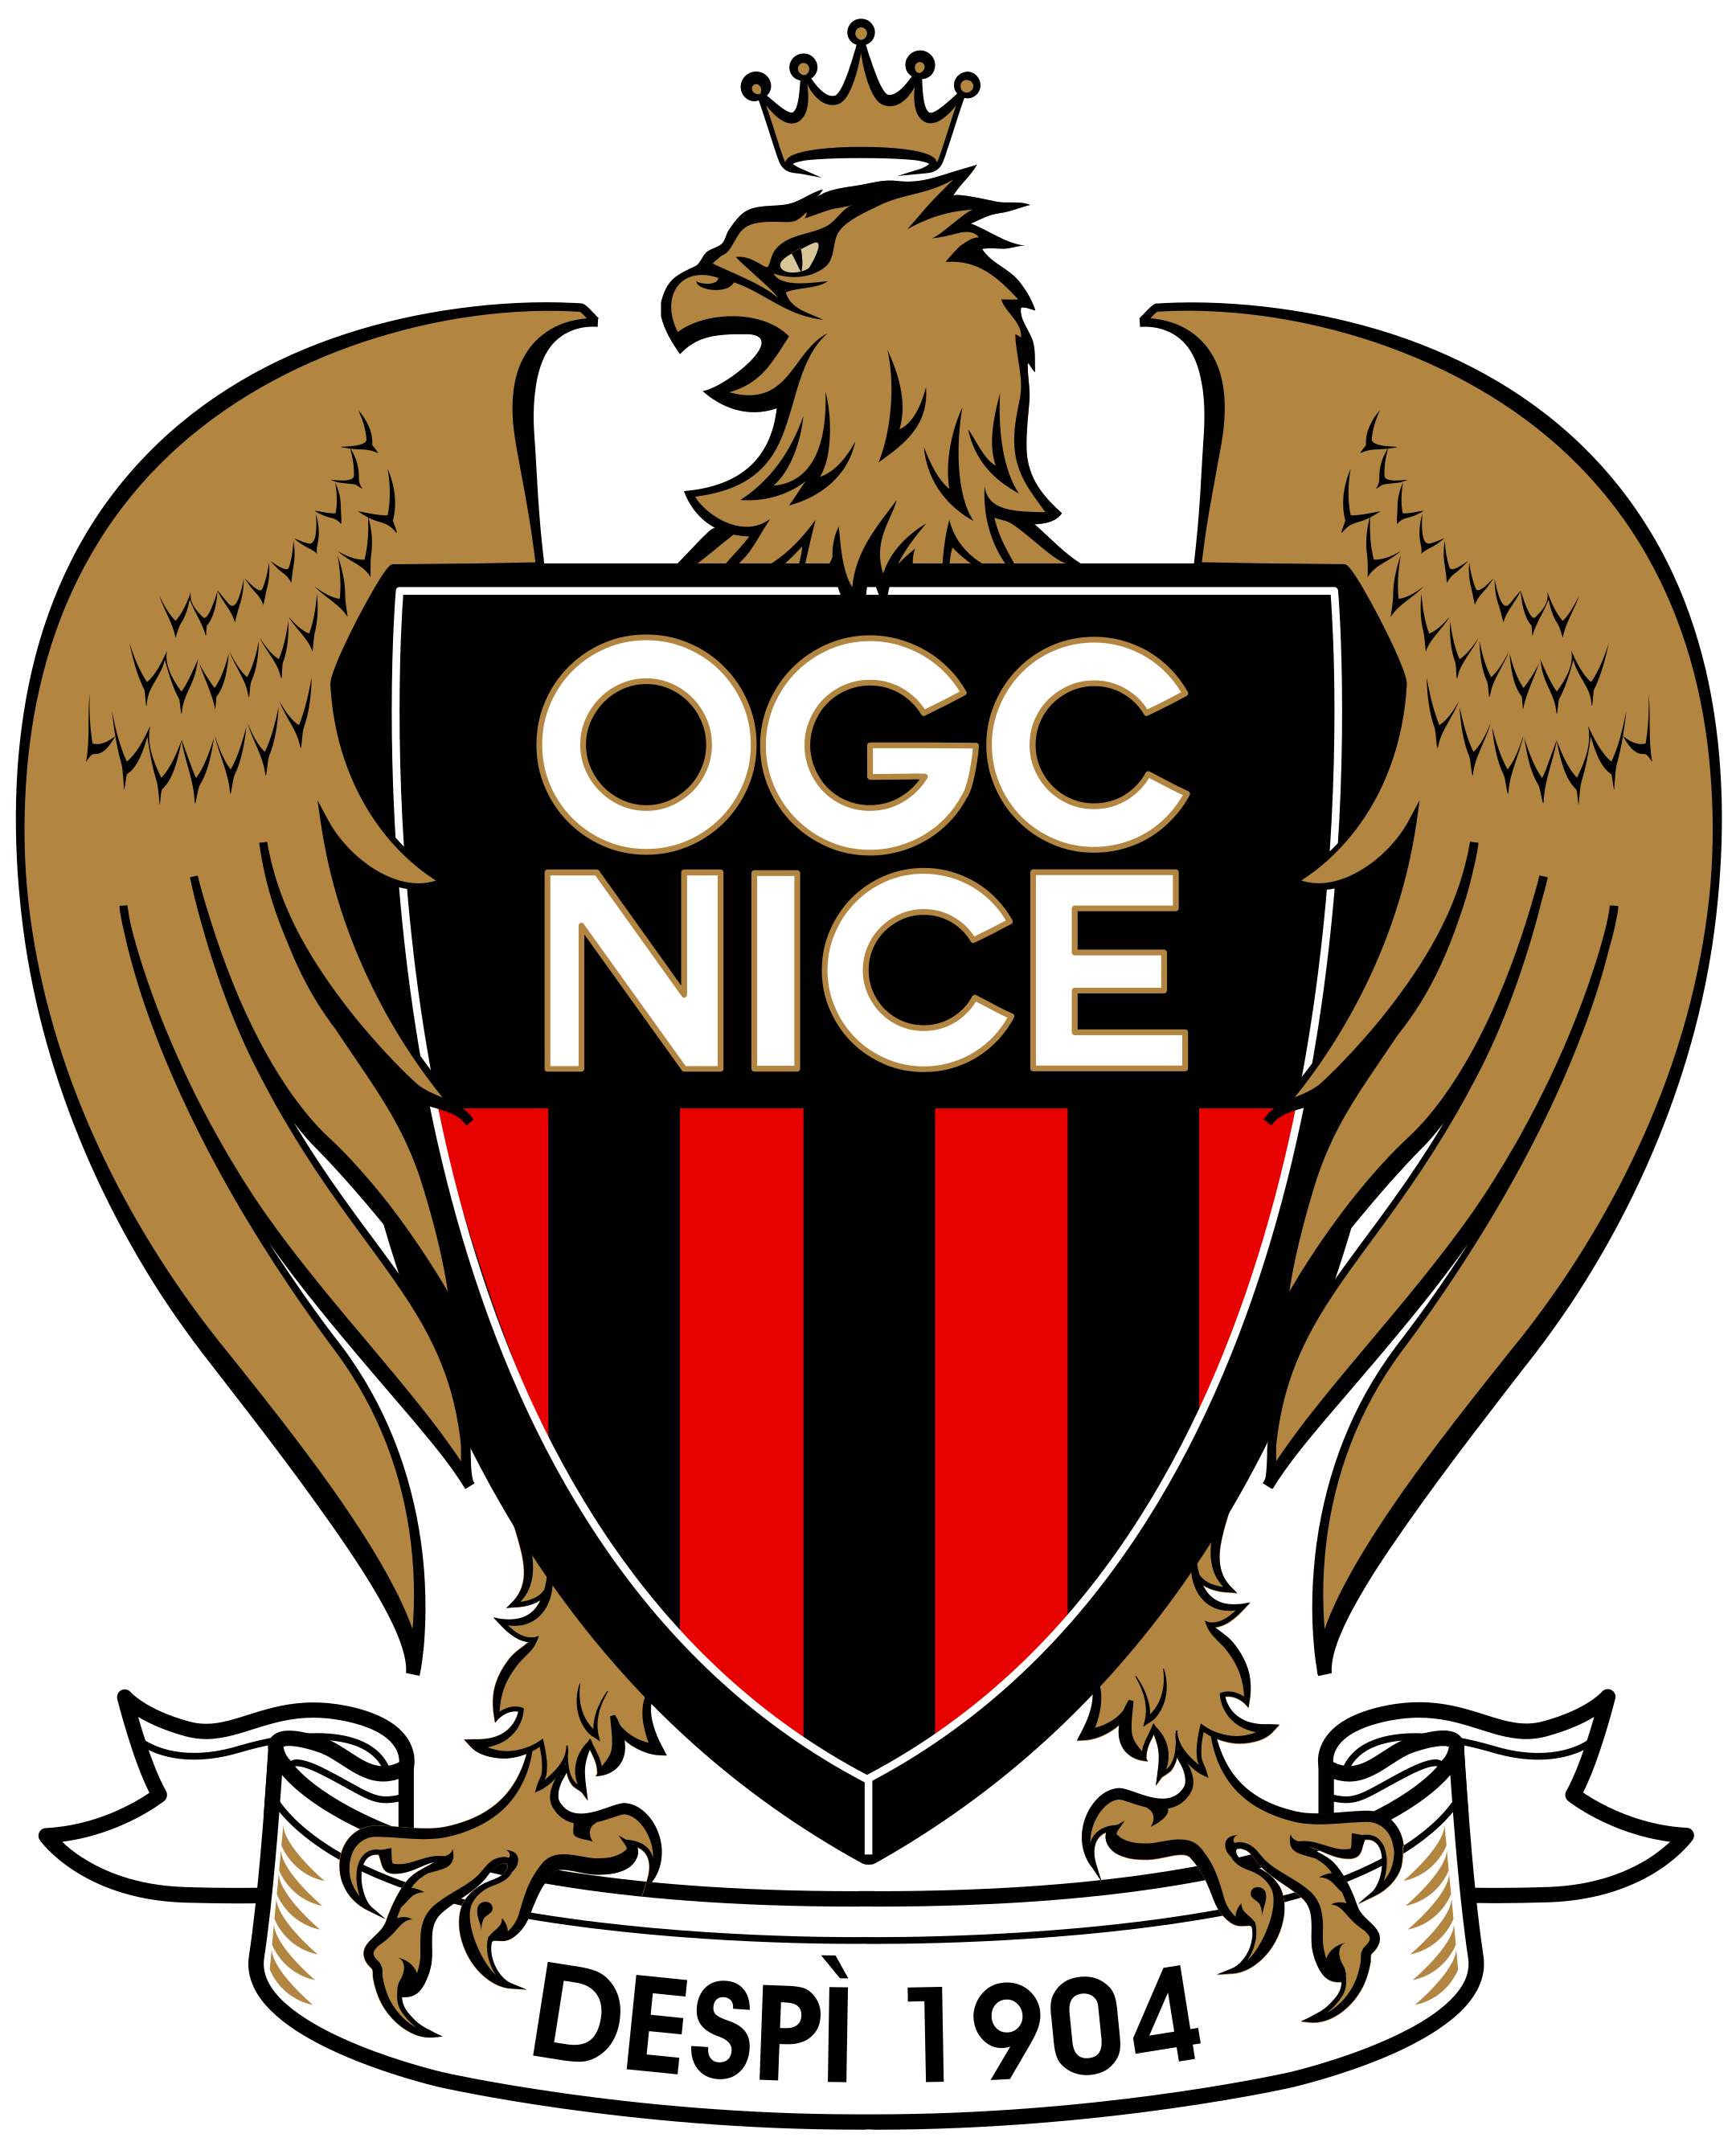 ogc nice logo 1 - OGC Nice Logo